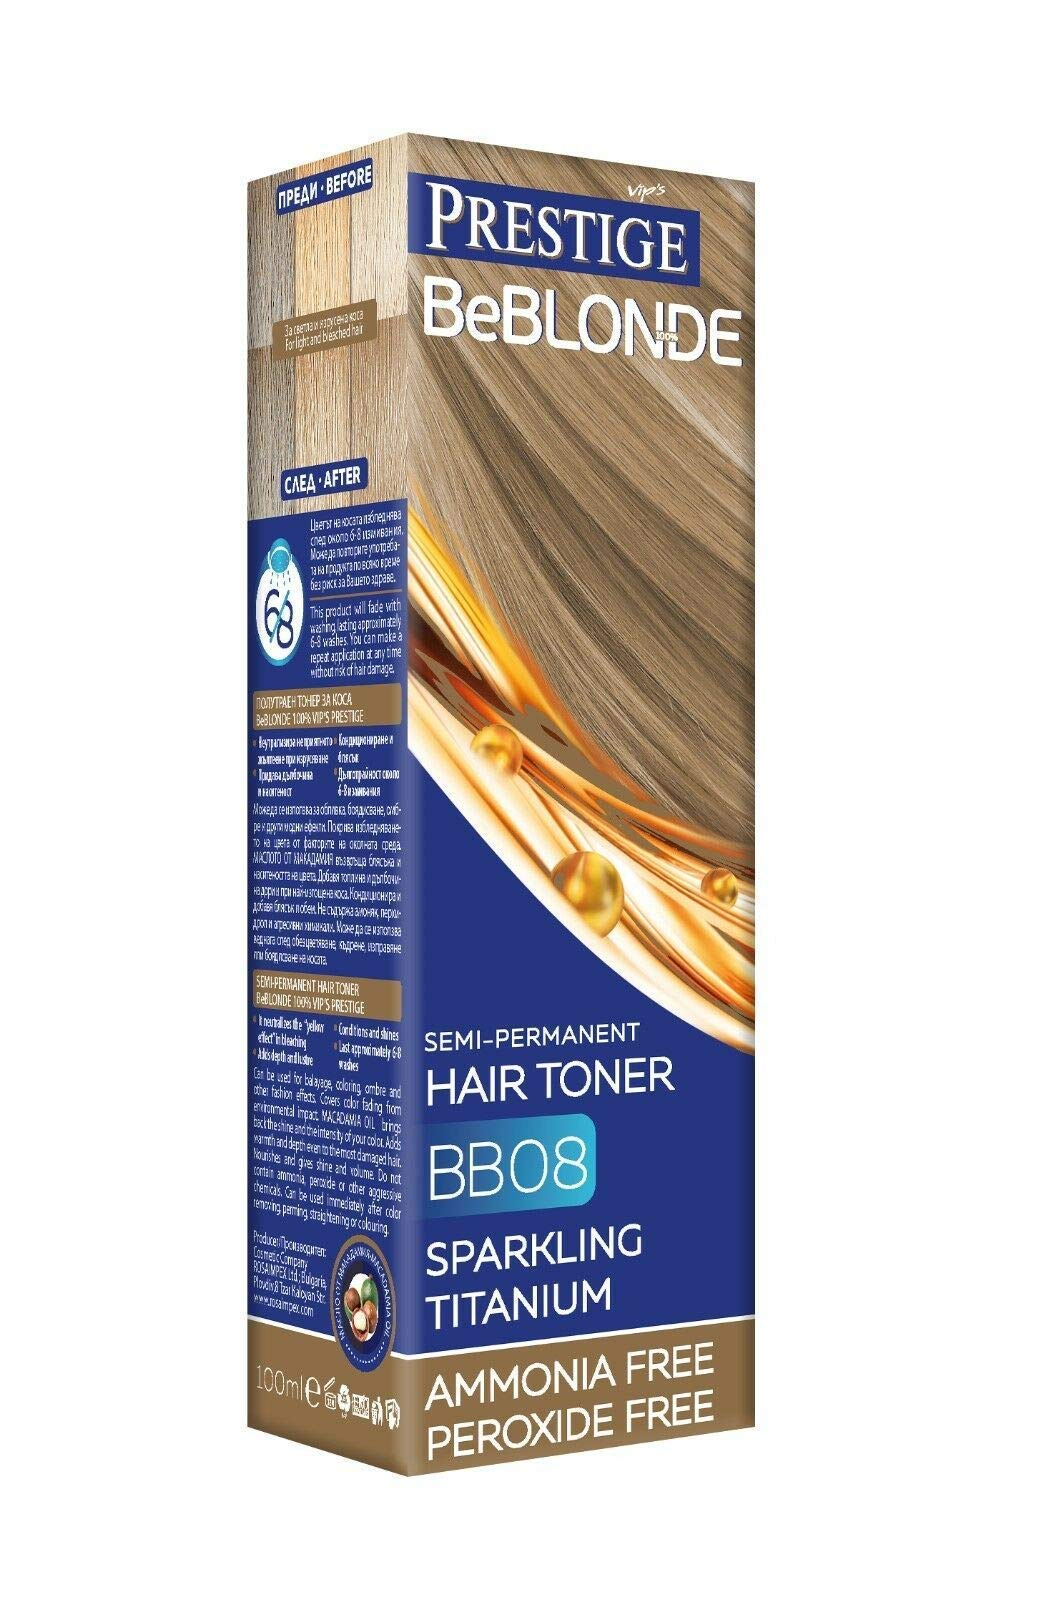 VIPs Prestige BeBlonde Semi Permanent Hair Toner Colour Sparkling Titanium BB08, No Ammonia No Peroxide